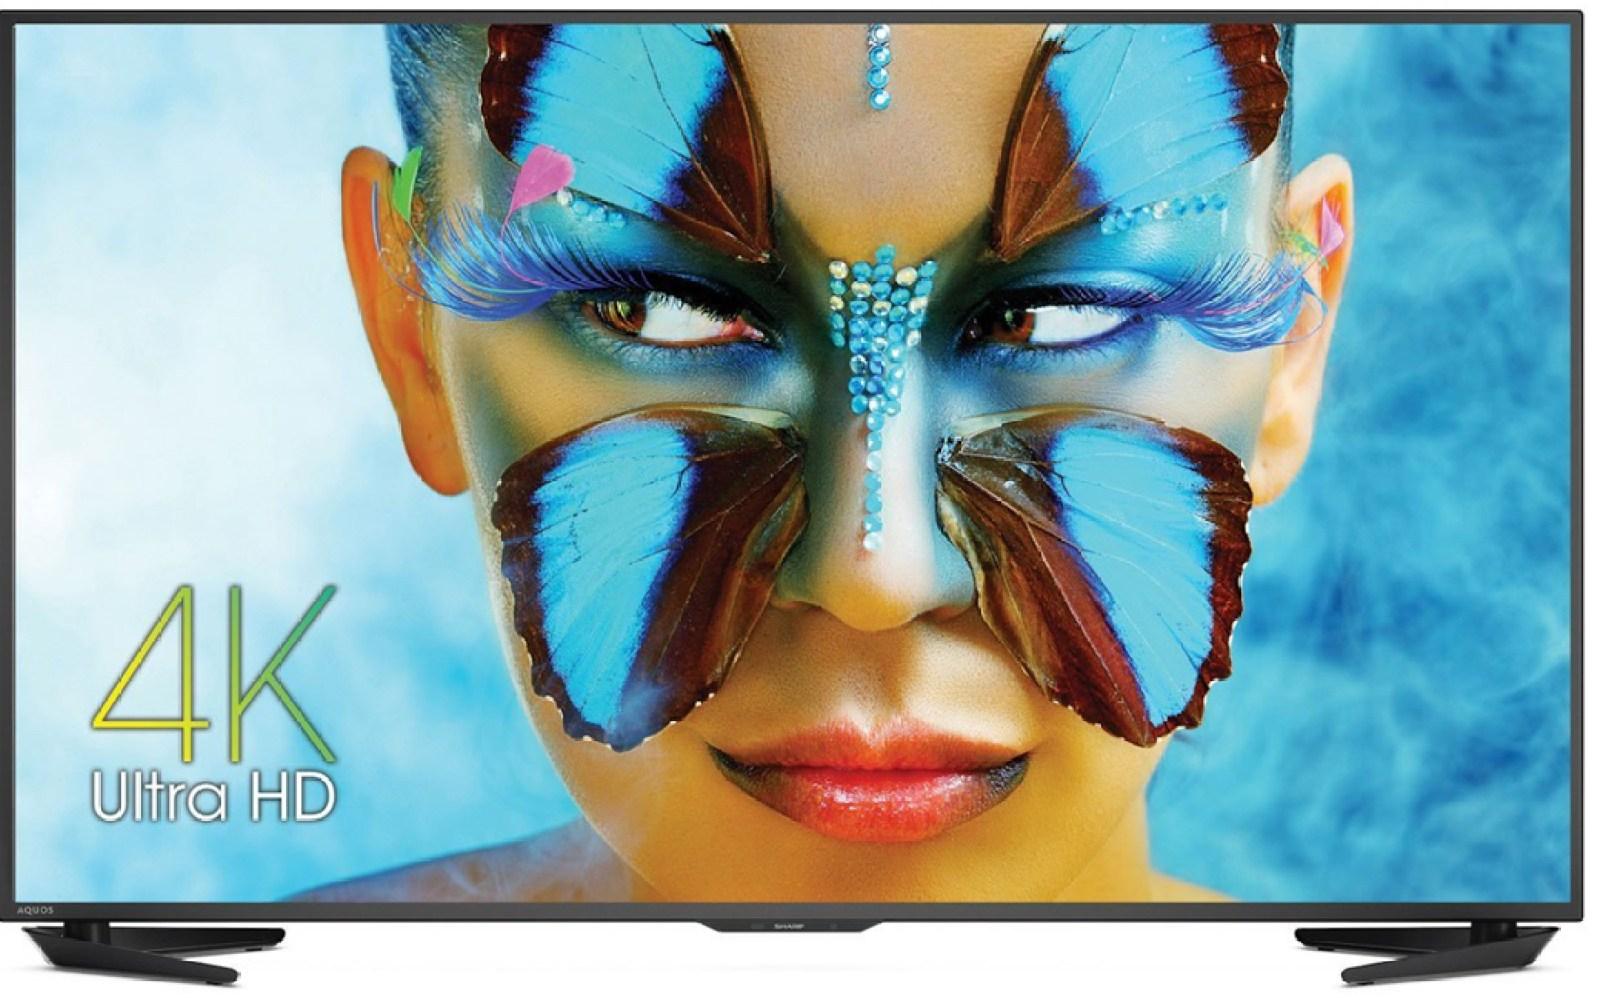 Daily Deals: Sharp AQUOS 55-inch Smart 4K Ultra HDTV $600, Logitech MX Master Wireless Mouse $79, more